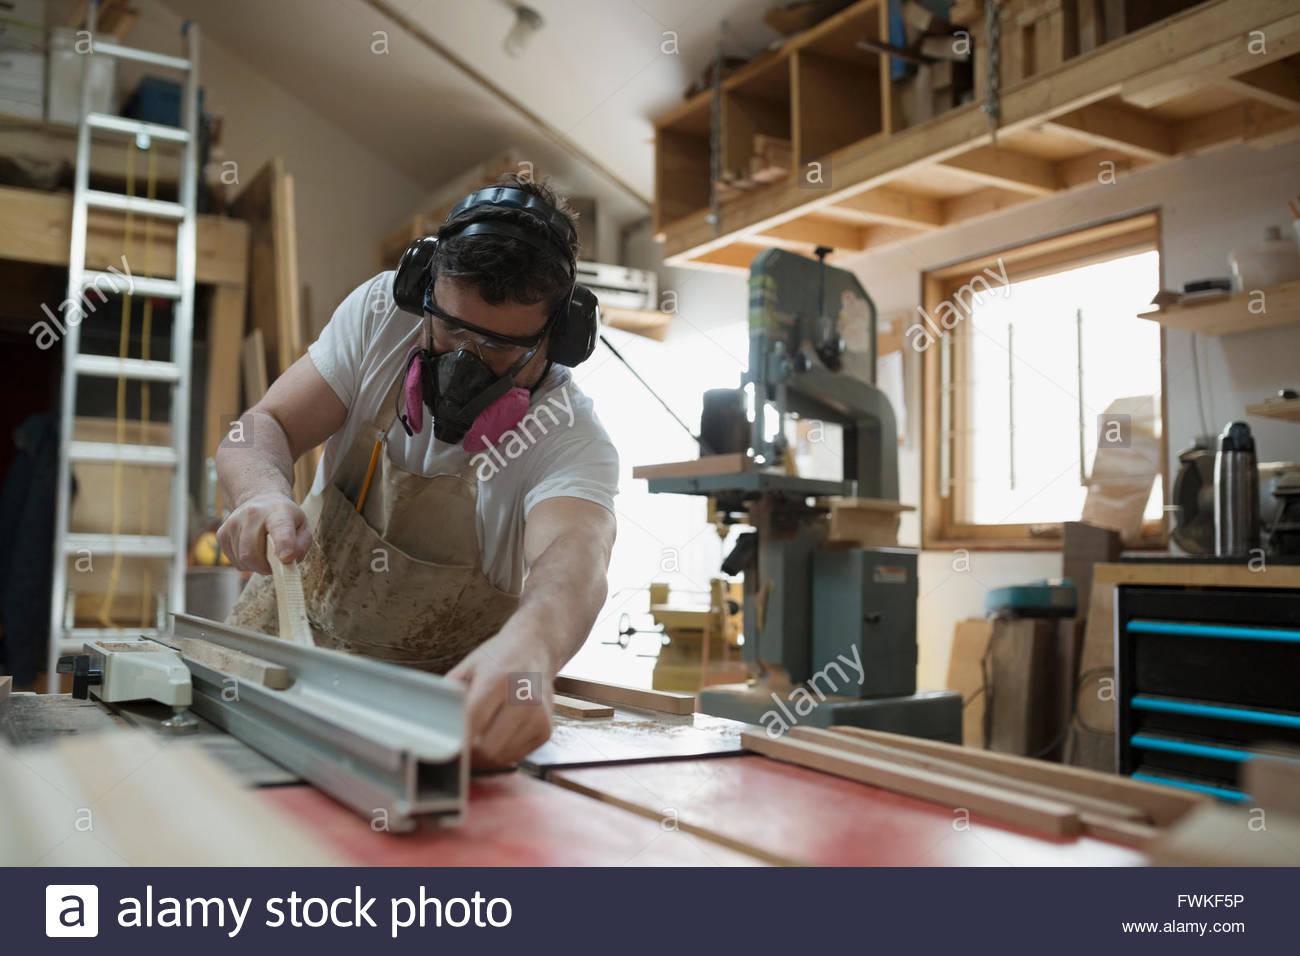 Carpenter wearing protective mask in workshop - Stock Image